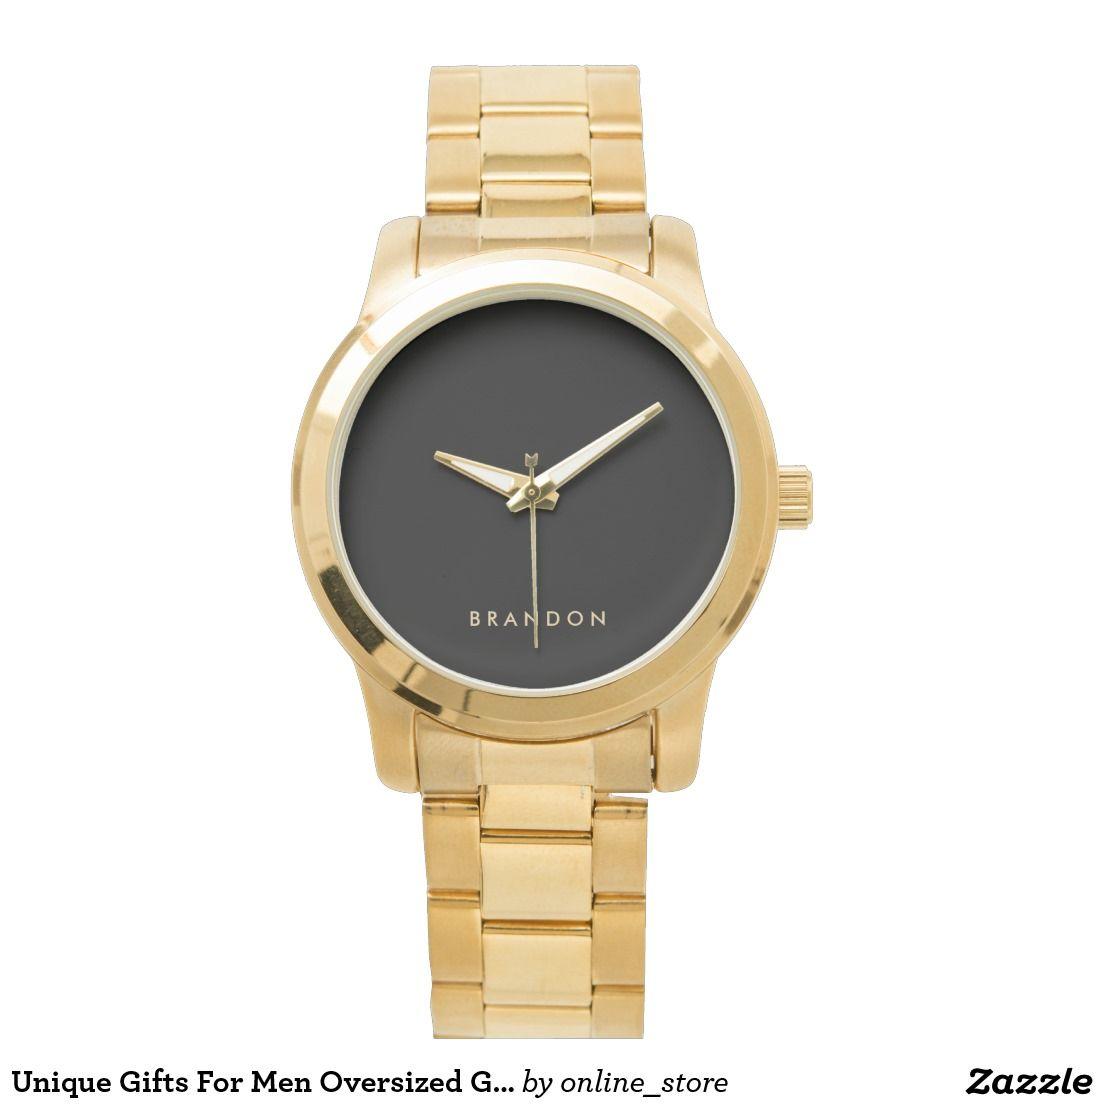 Unique Gifts For Men Oversized Gold Bracelet Watch